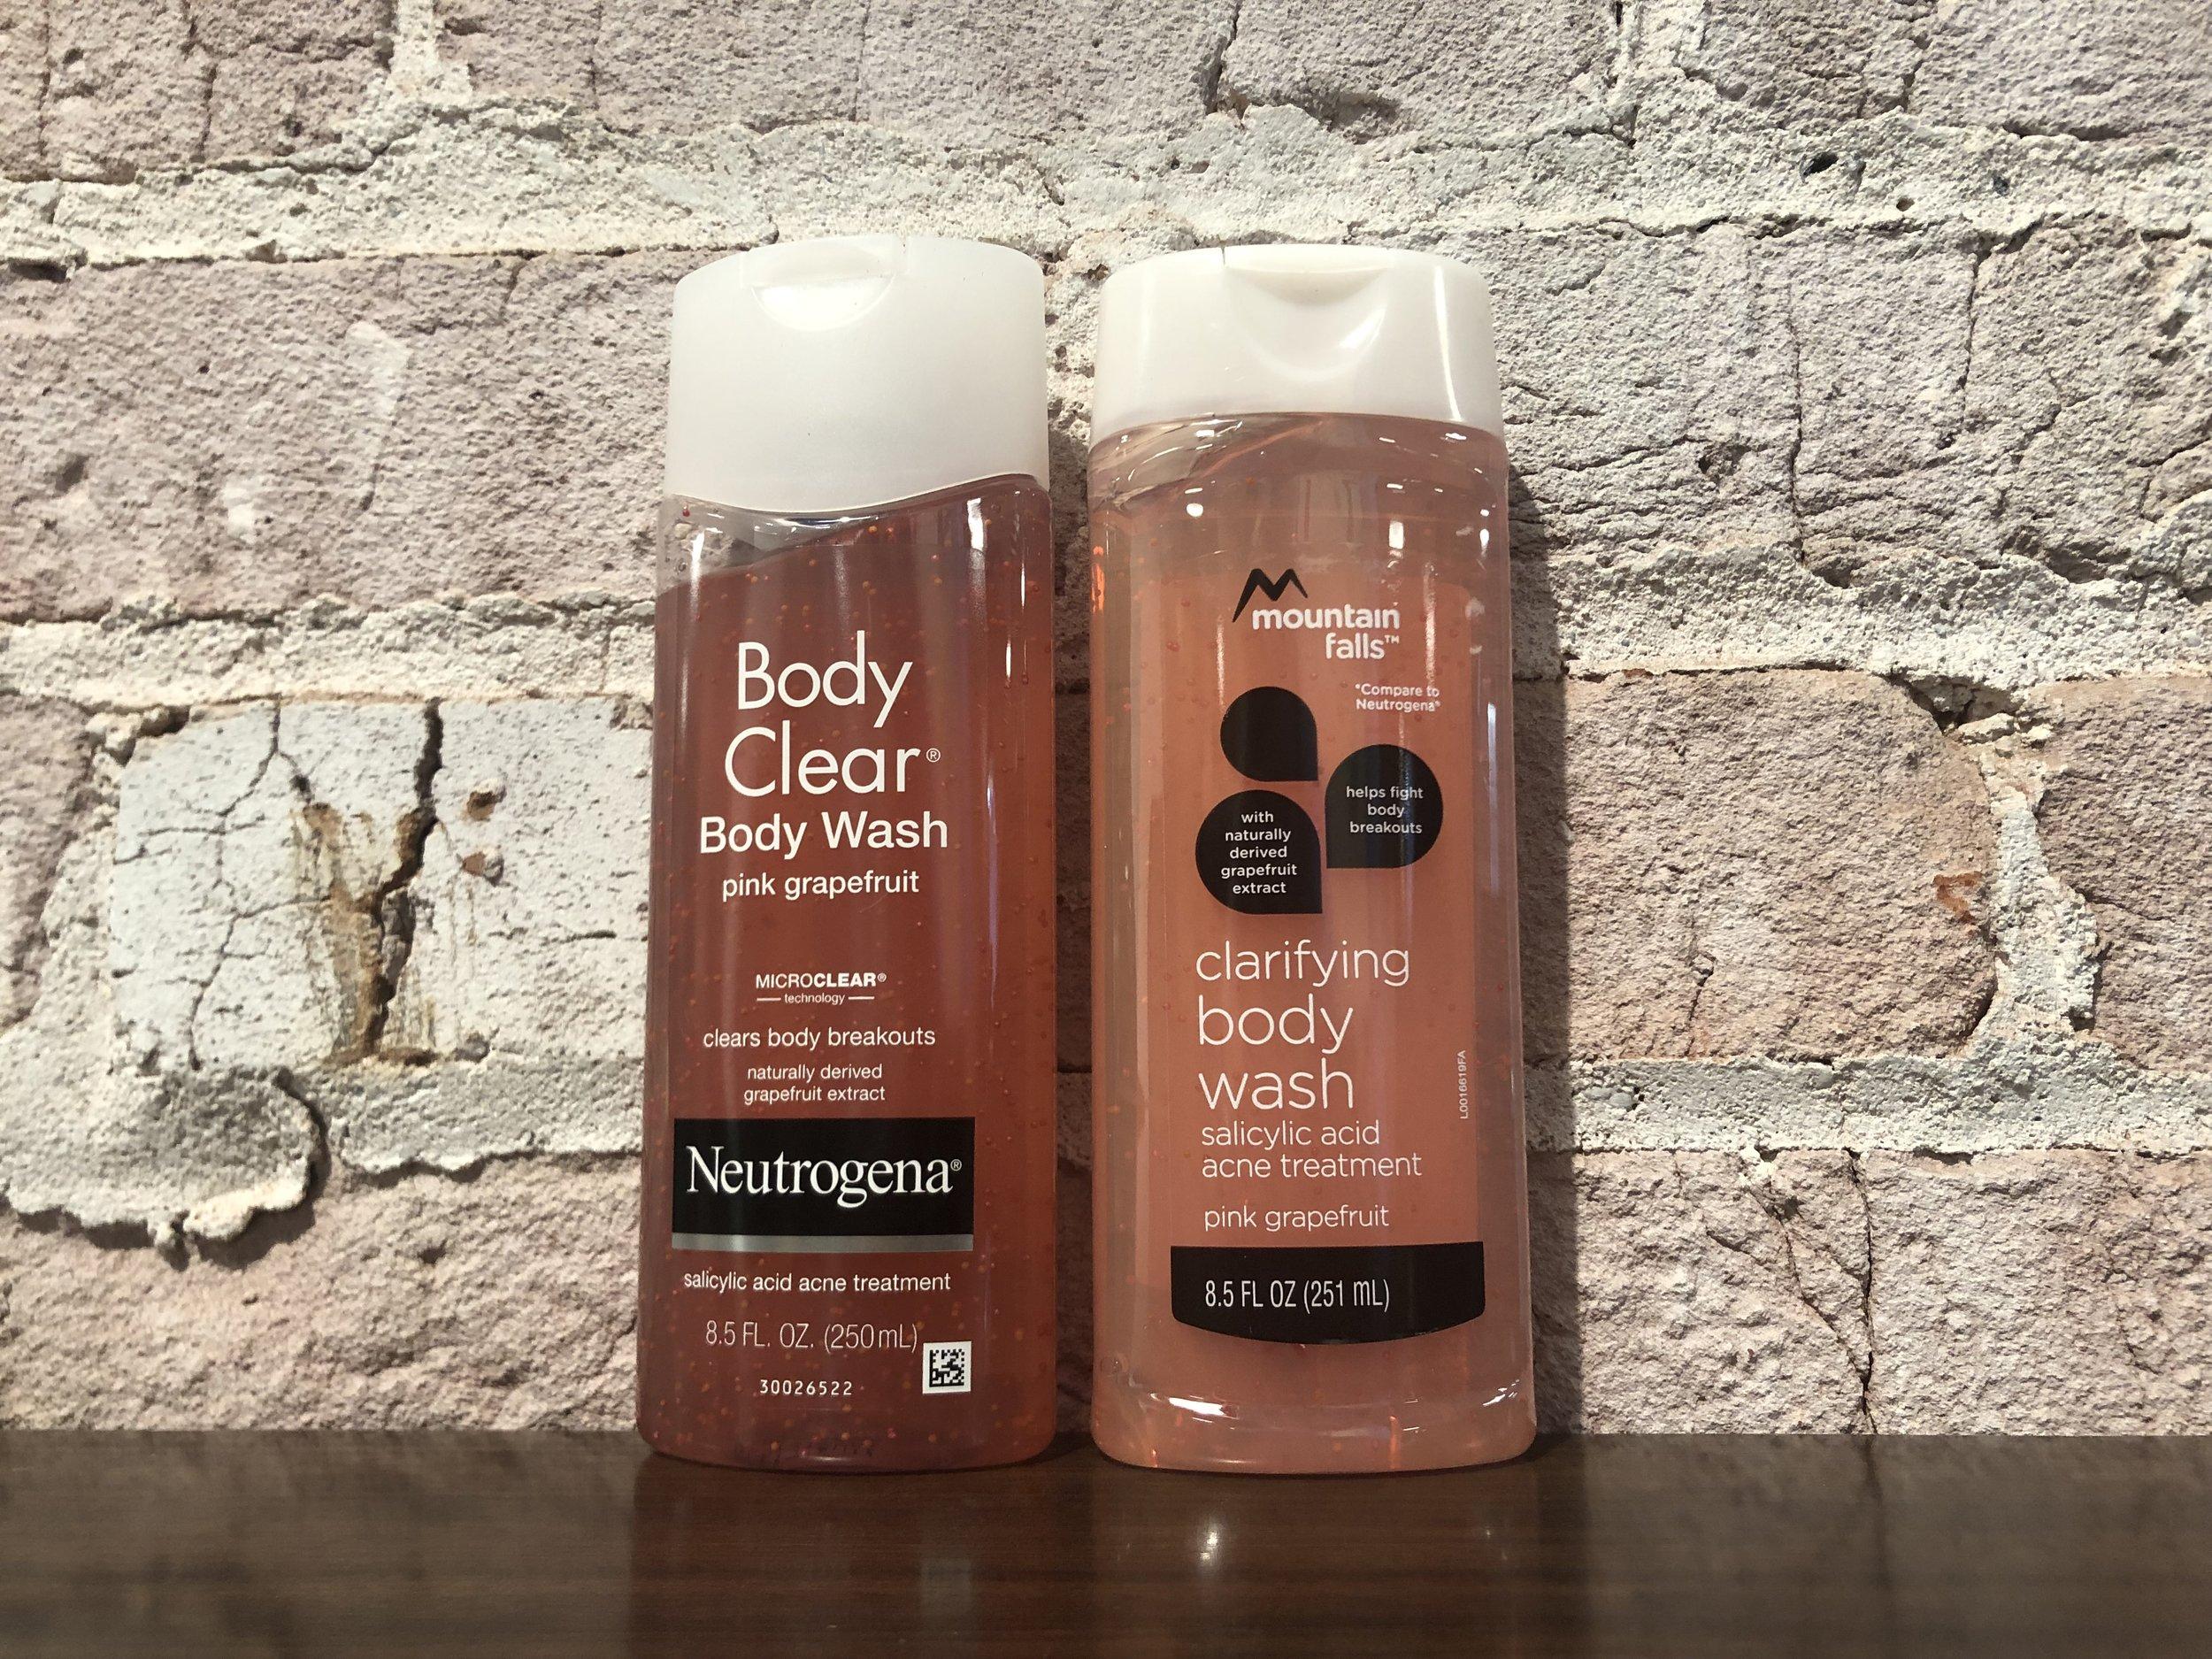 Neutrogena Body Clear Body Wash Pink Grapefruit Vs Amazon